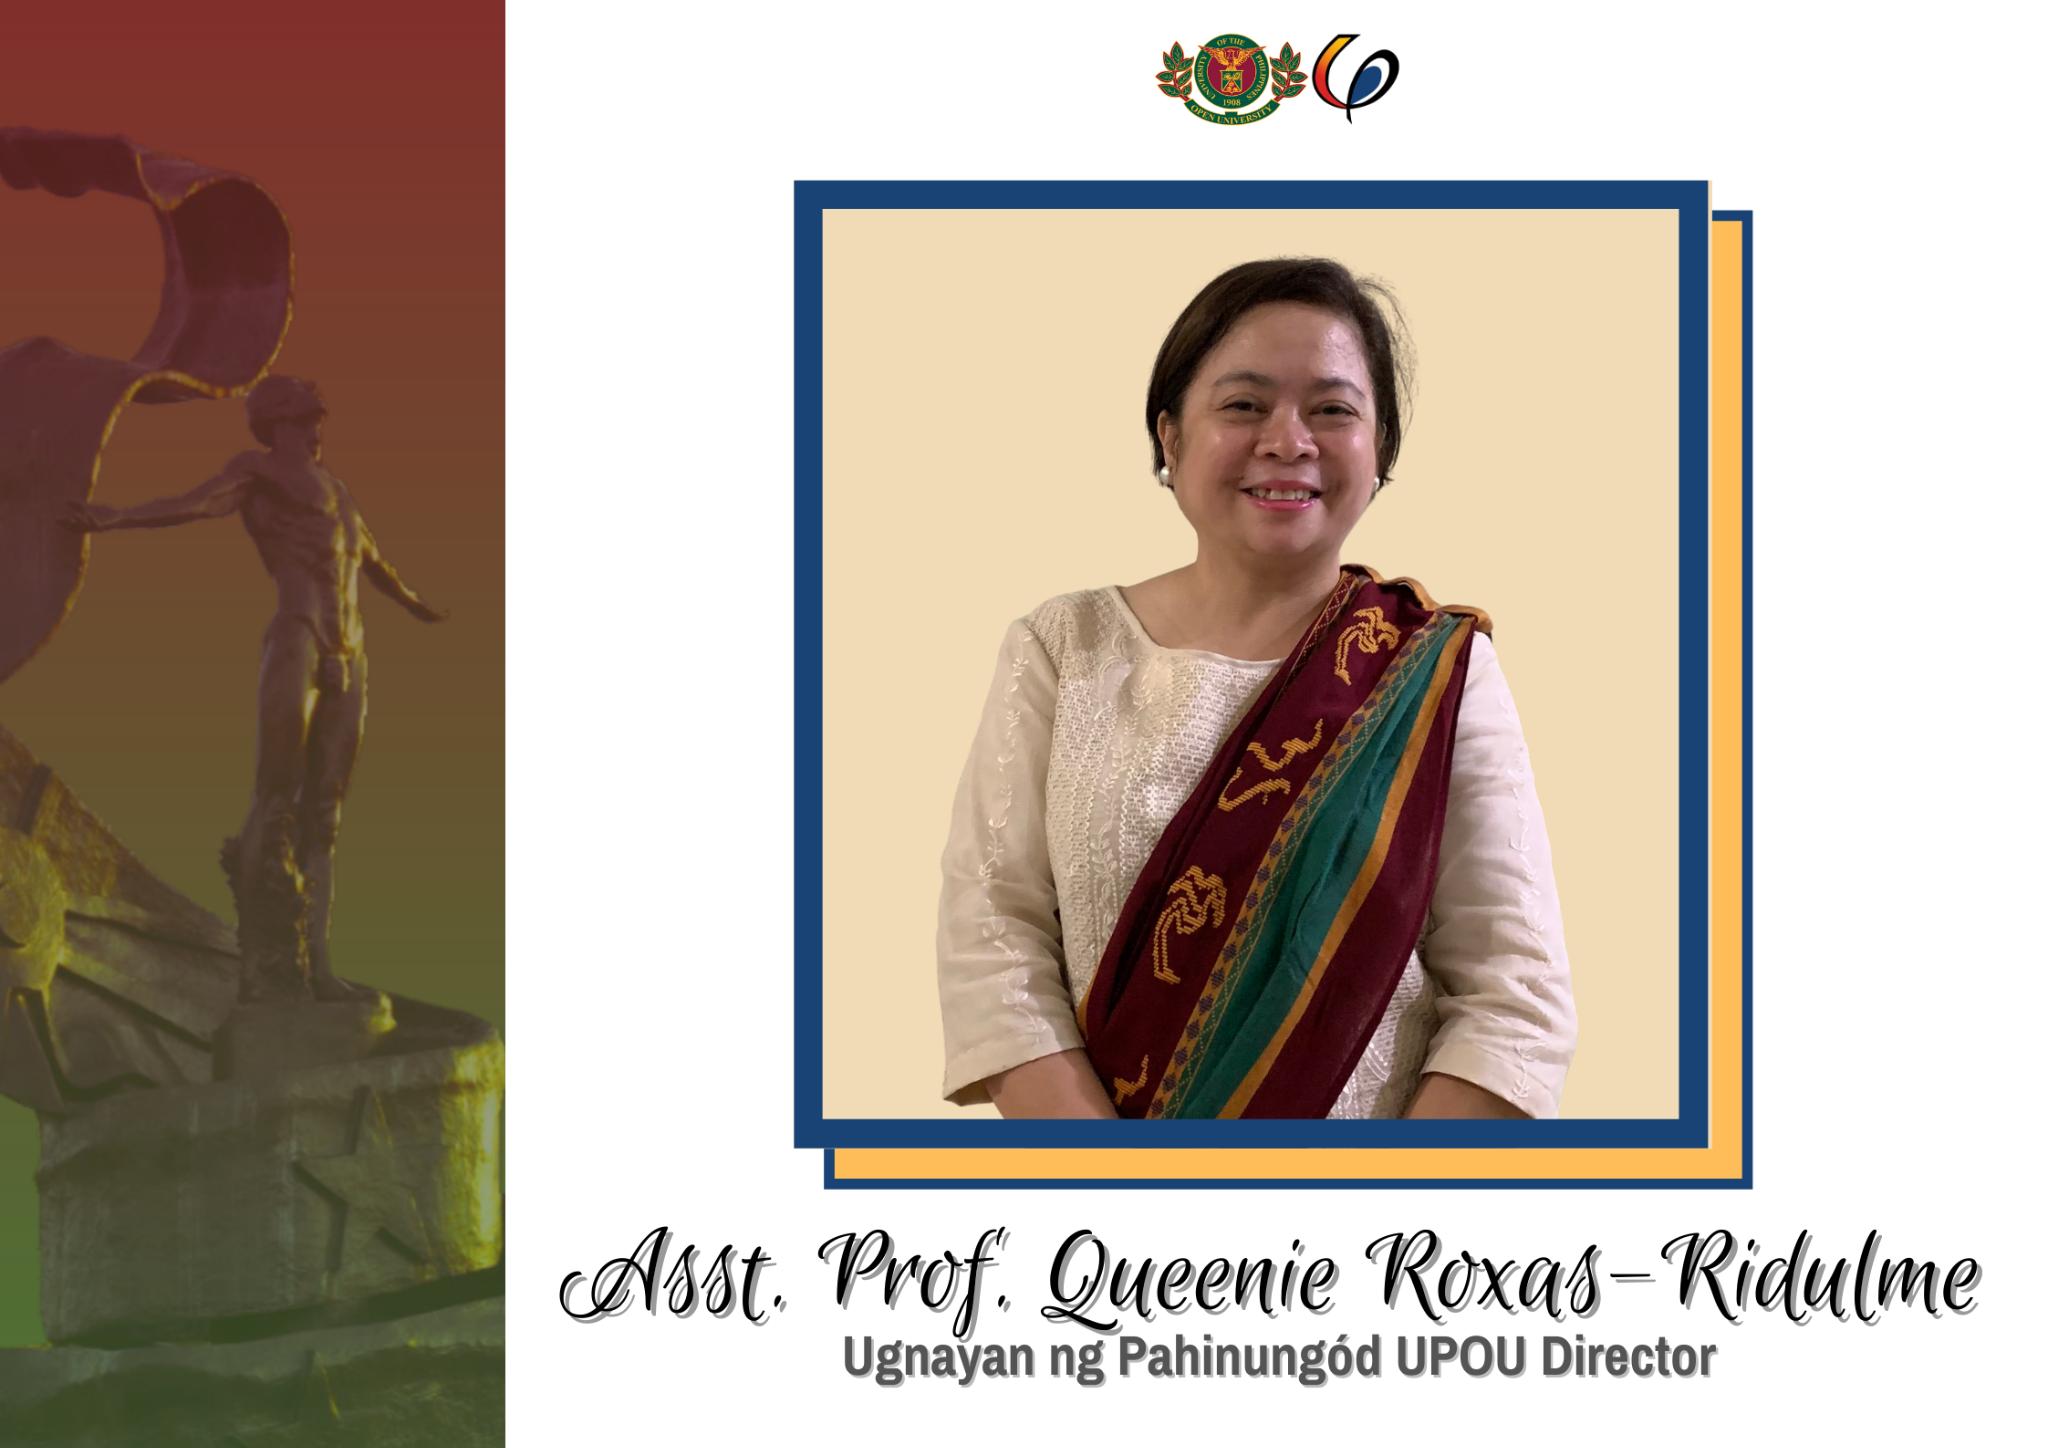 Ugnayan ng Pahinungód UPOU welcomes its new Director